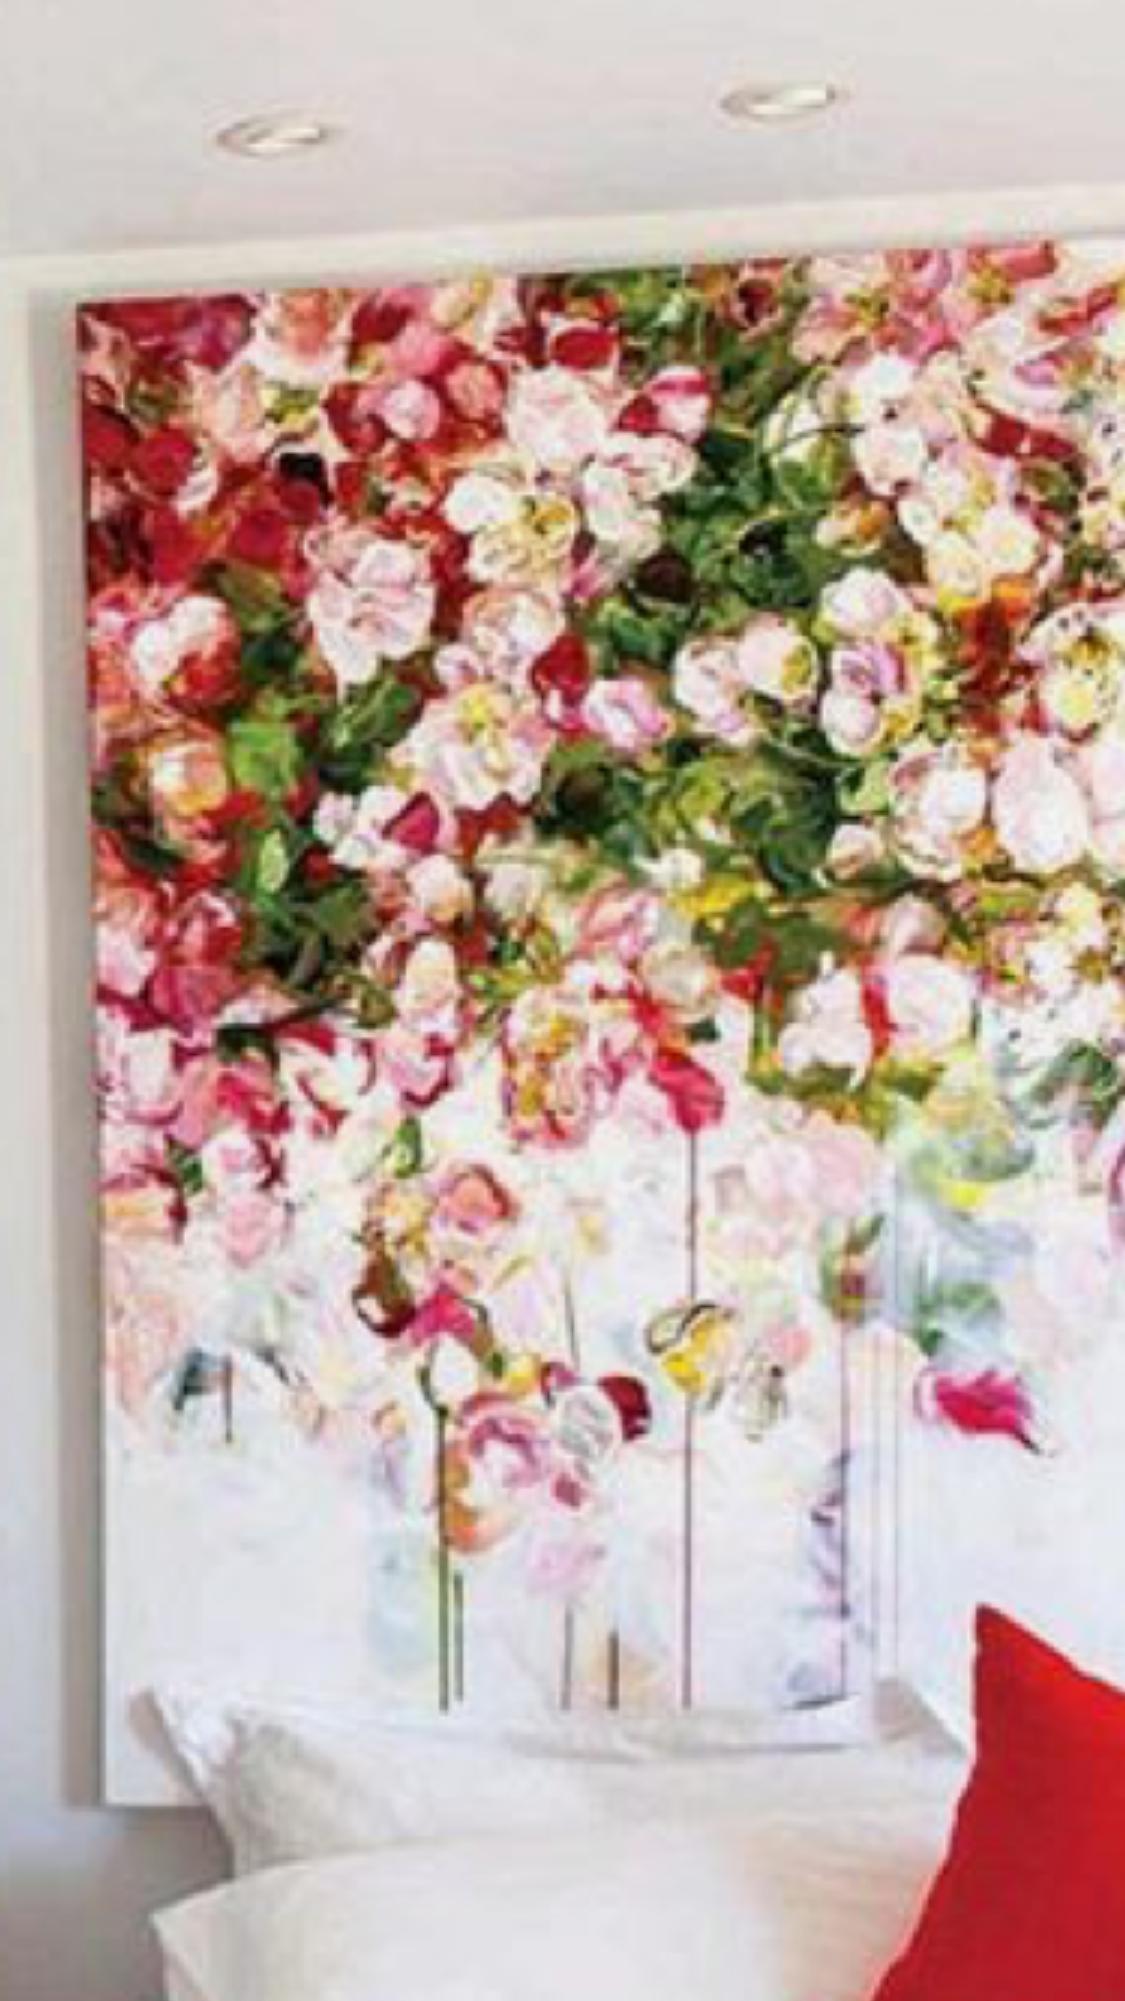 Pin de Regina Wills-Sargeant en Art - Roses | Pinterest | Cuadro ...